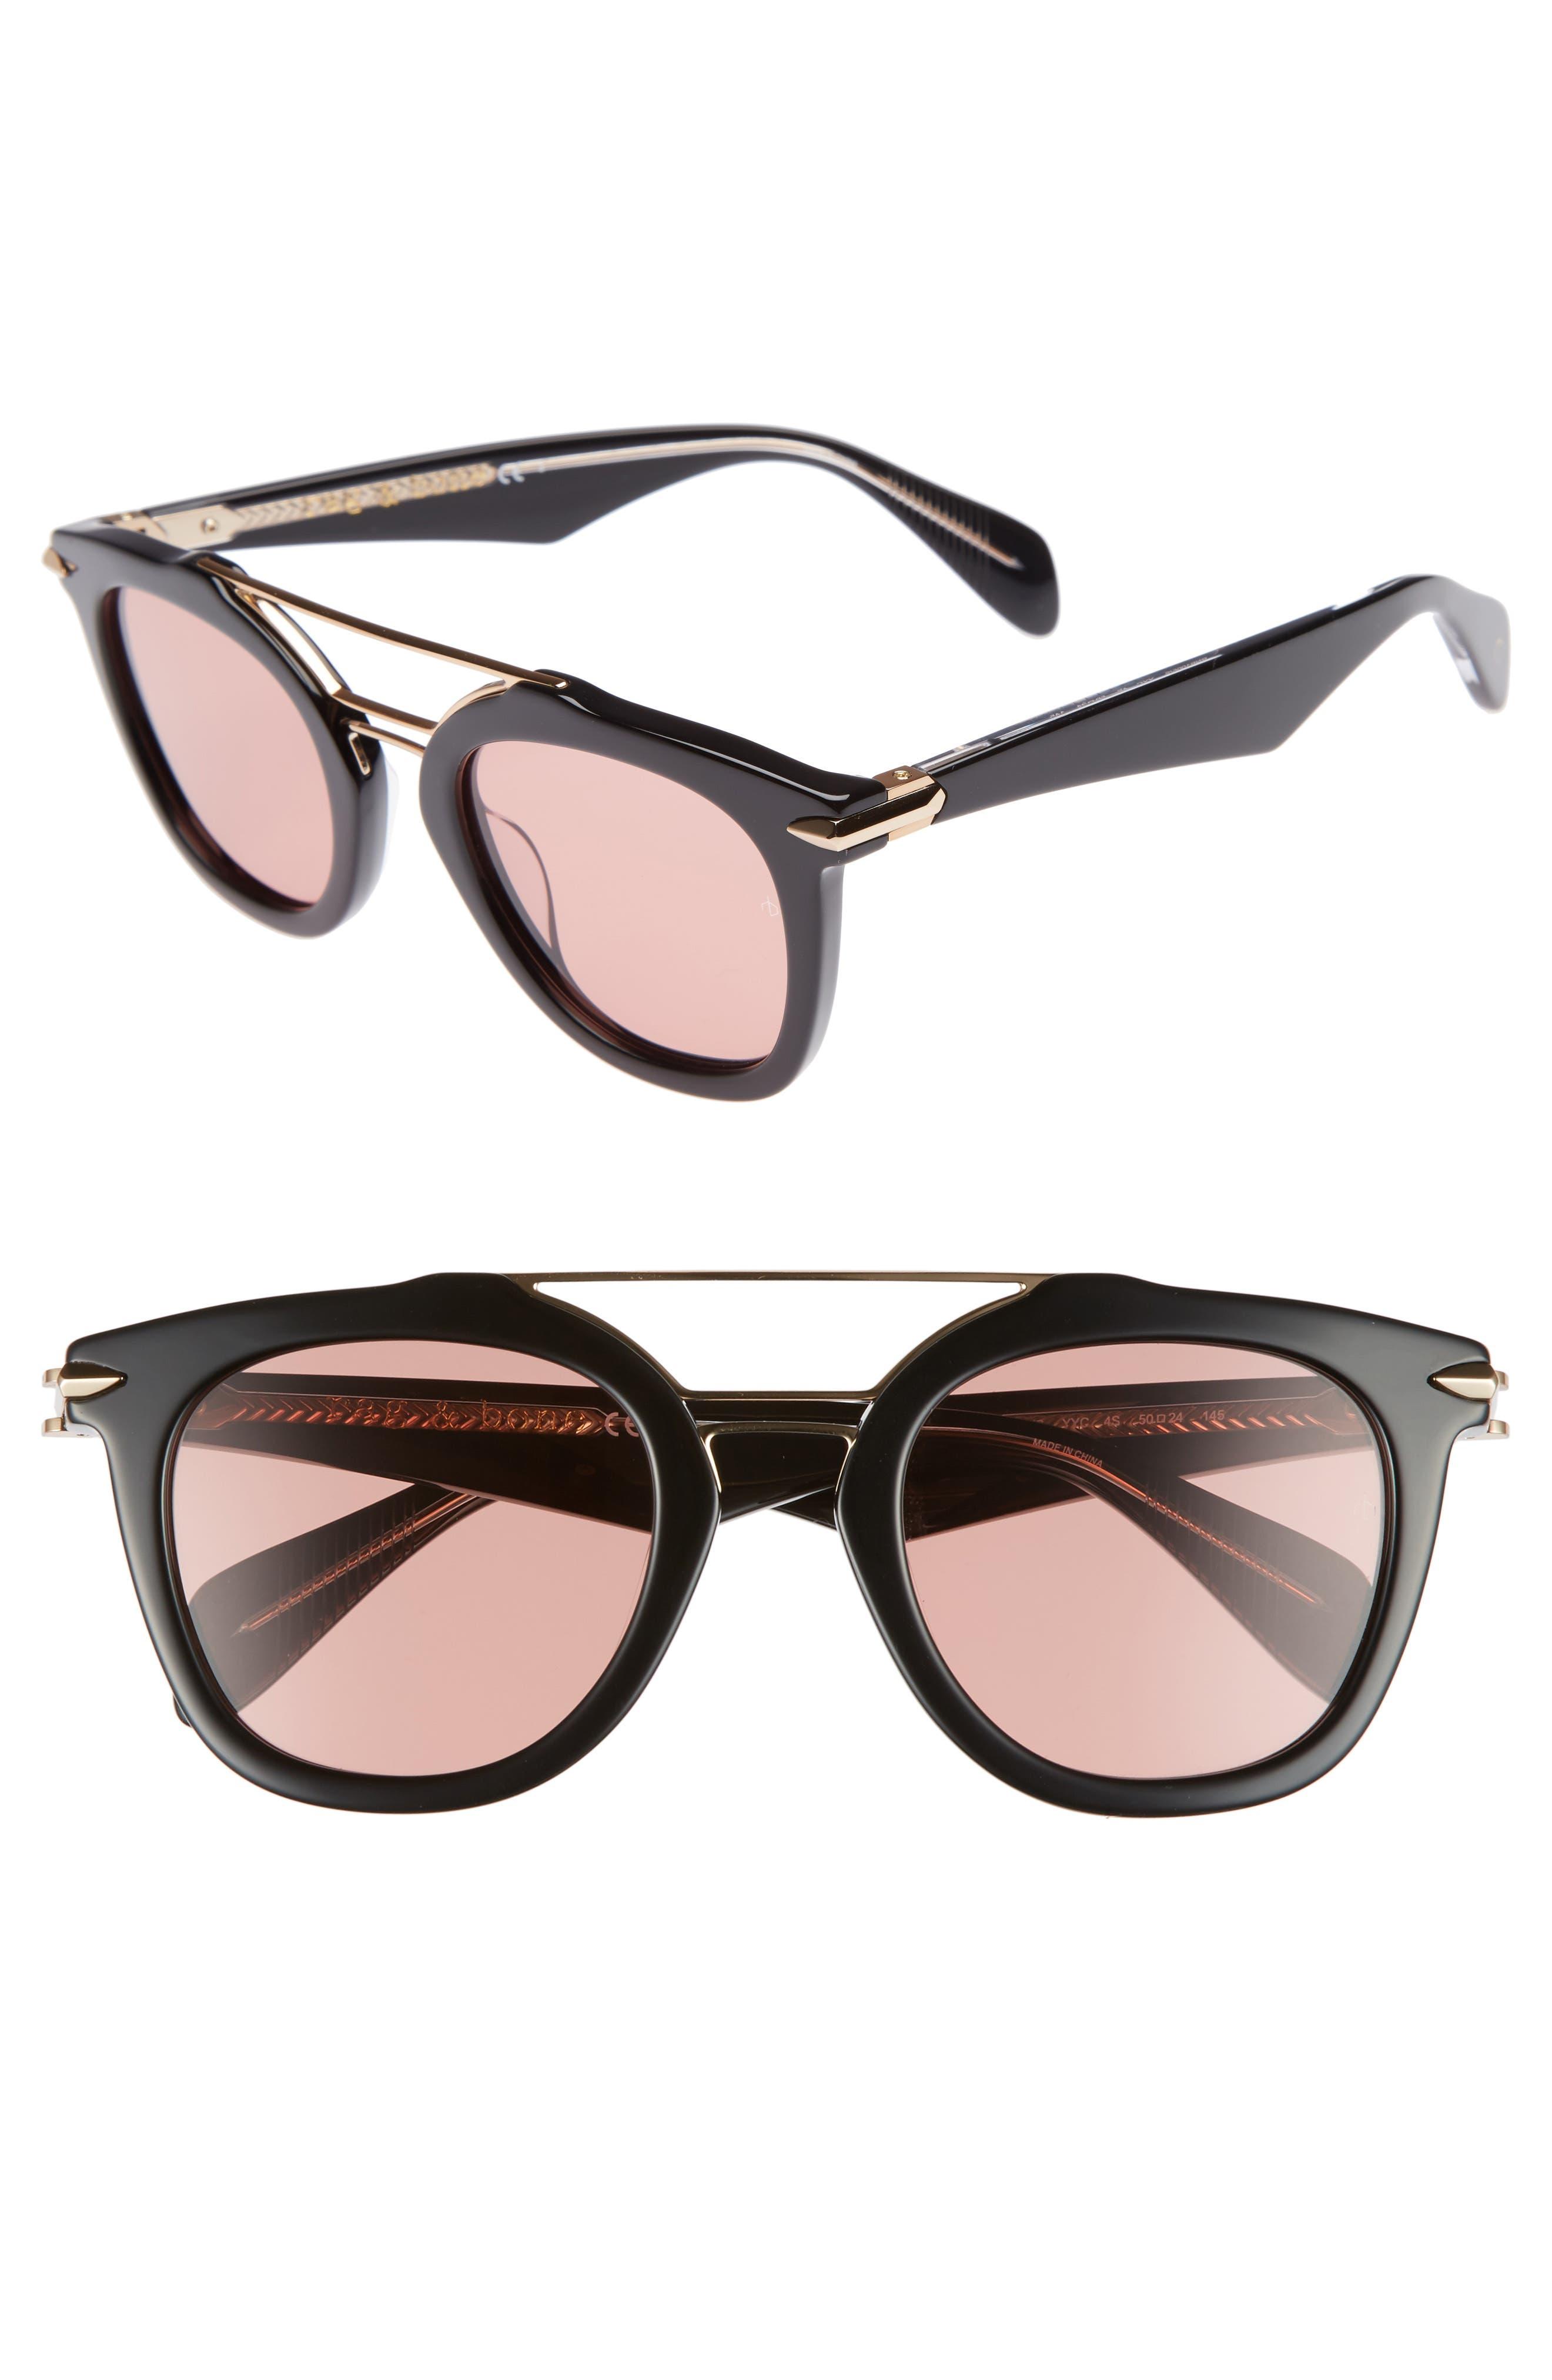 50mm Round Aviator Sunglasses,                             Main thumbnail 1, color,                             BLACK/ GOLD/ BRONZE